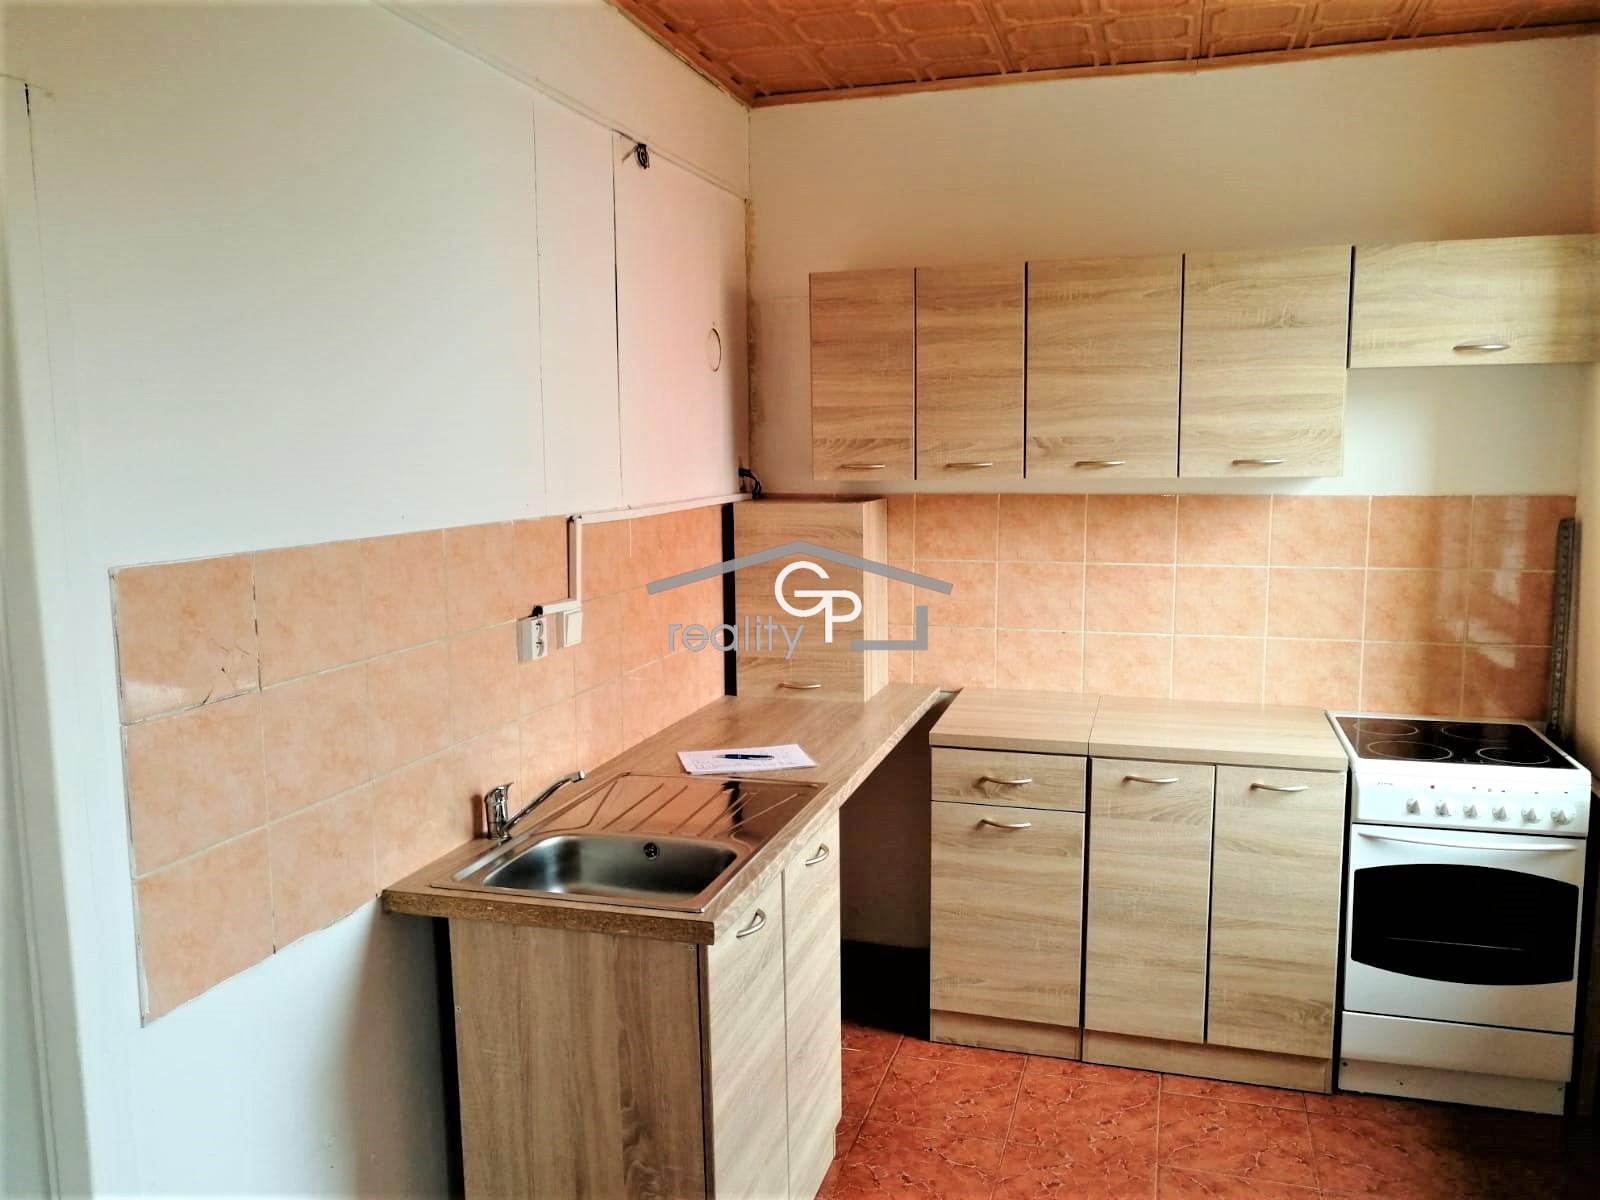 Pronájem bytu 3+1, ul. Lipová, Český Krumlov